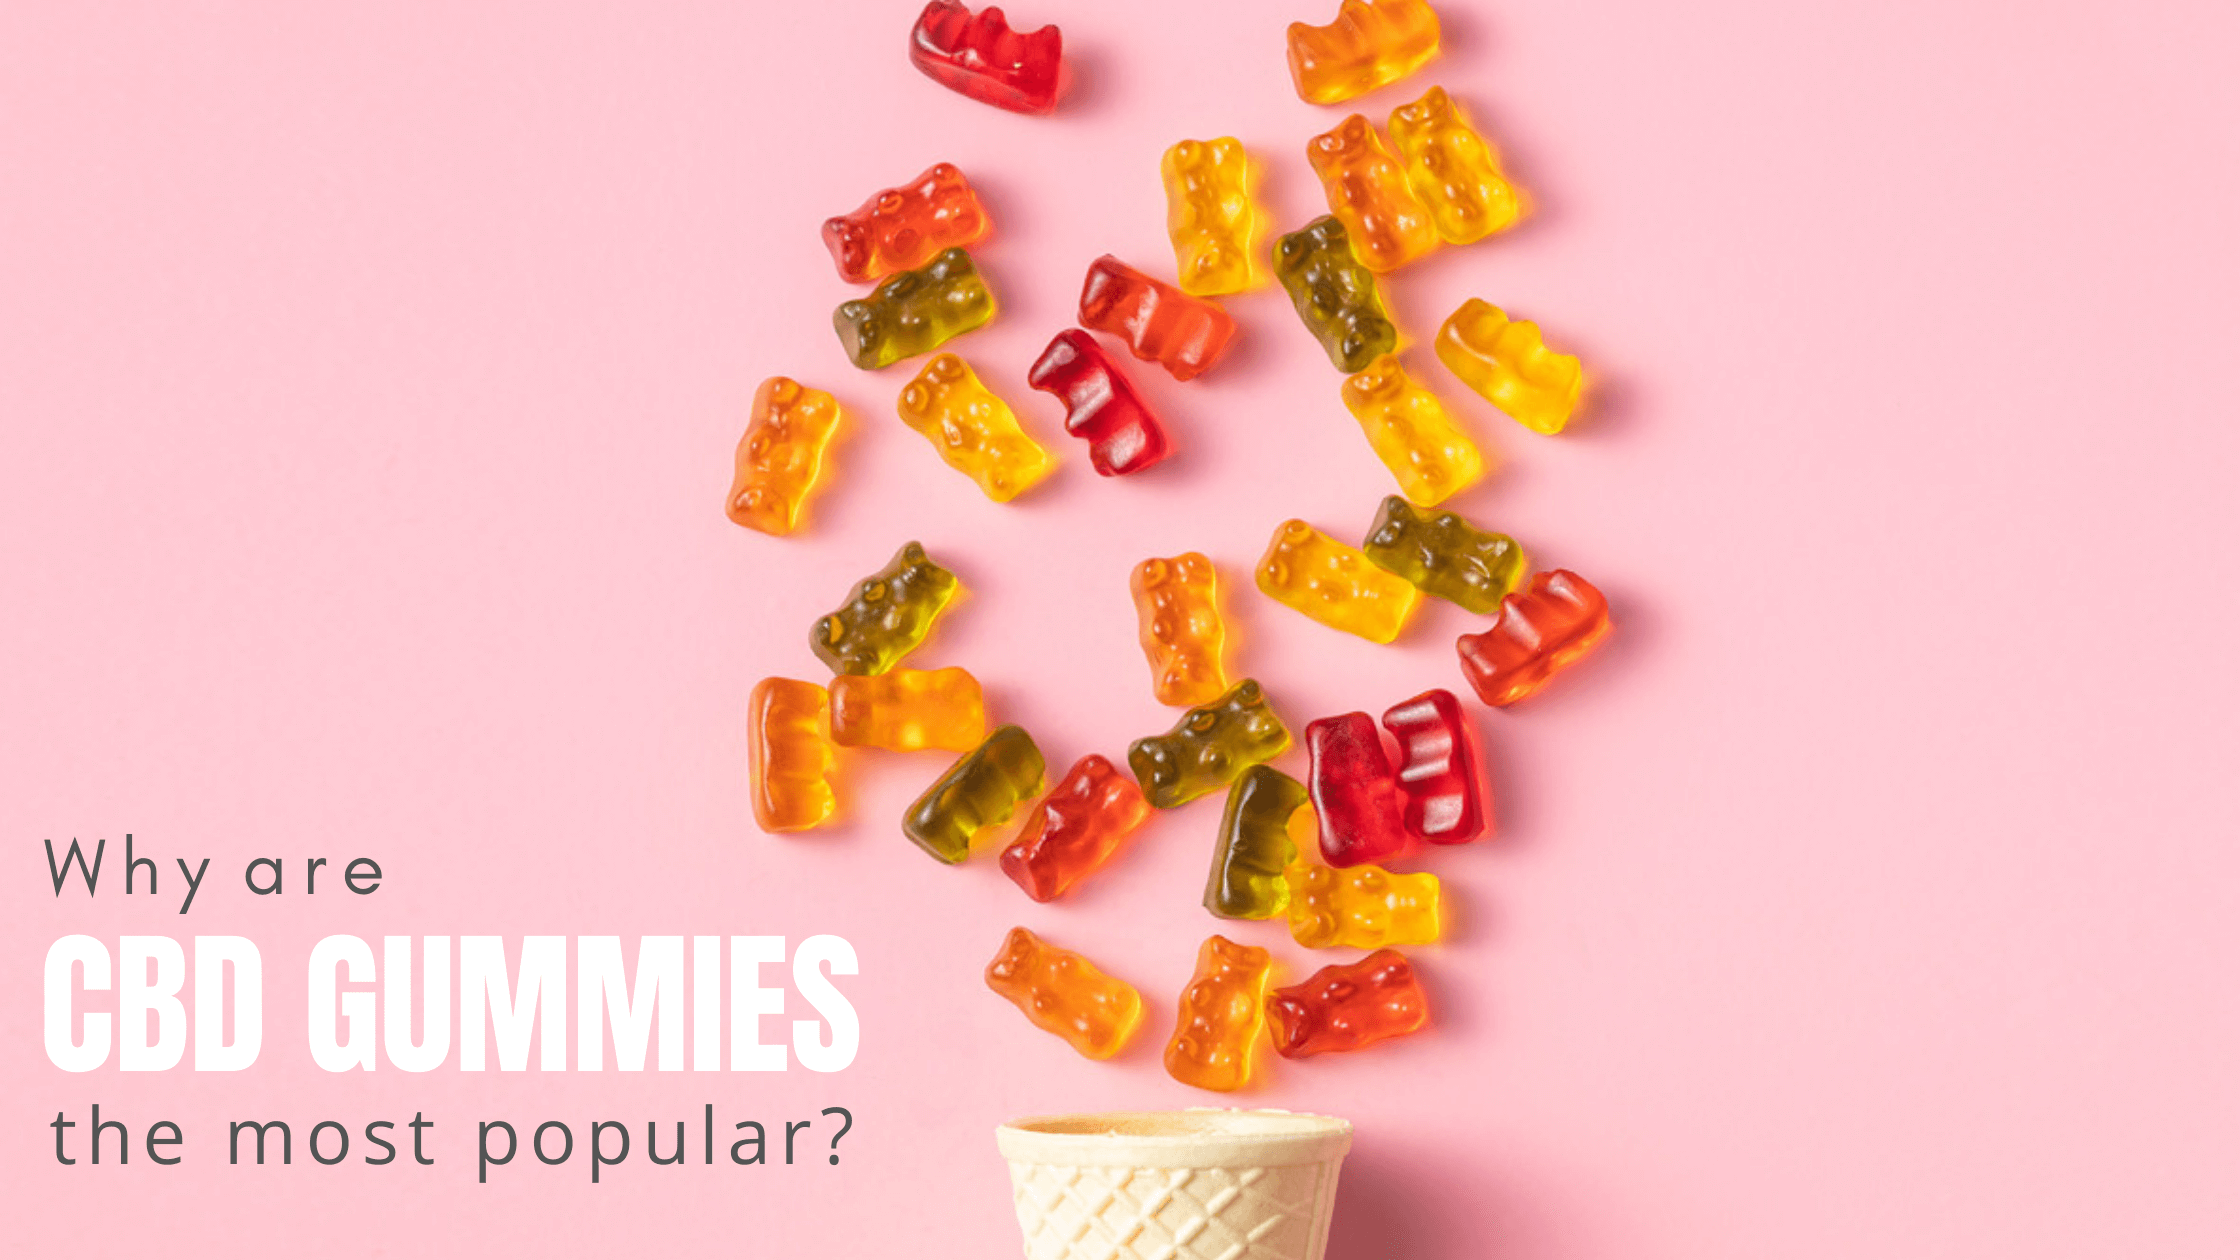 CBD Gummies Are the Most Popular Medical Marijuana Edibles